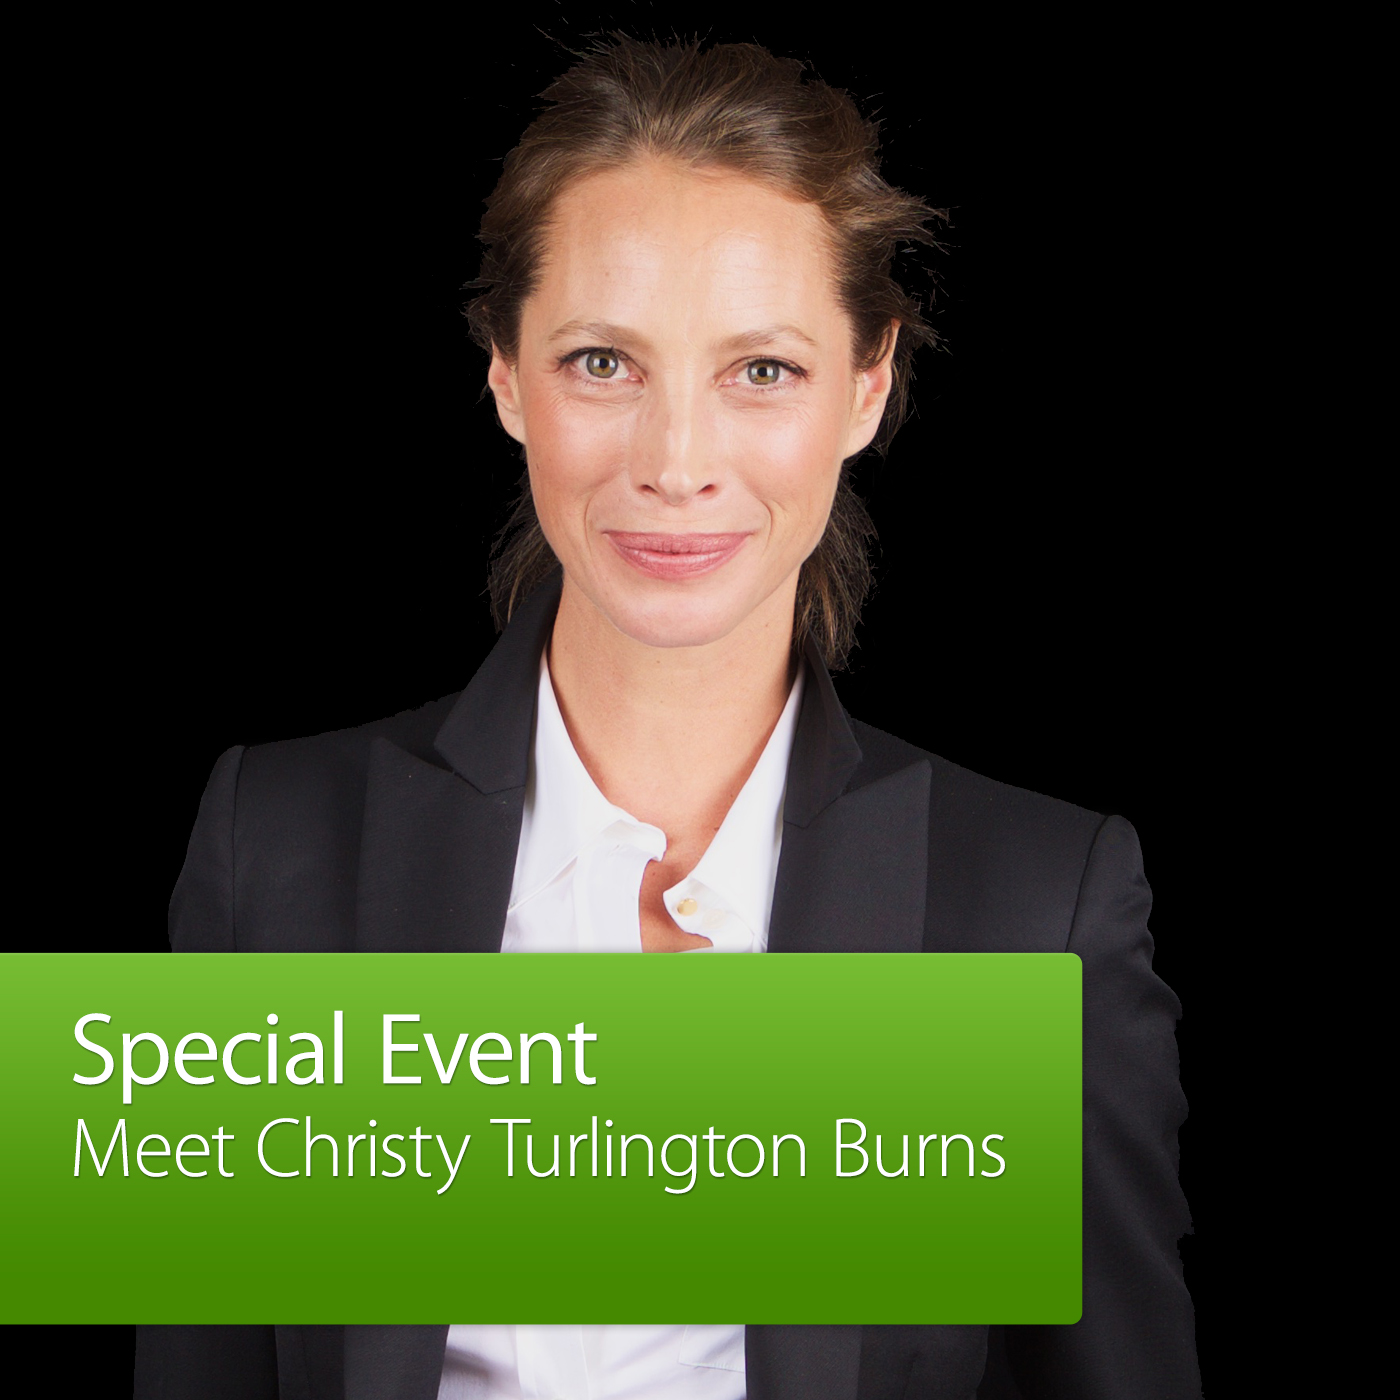 Meet Christy Turlington Burns: Special Event